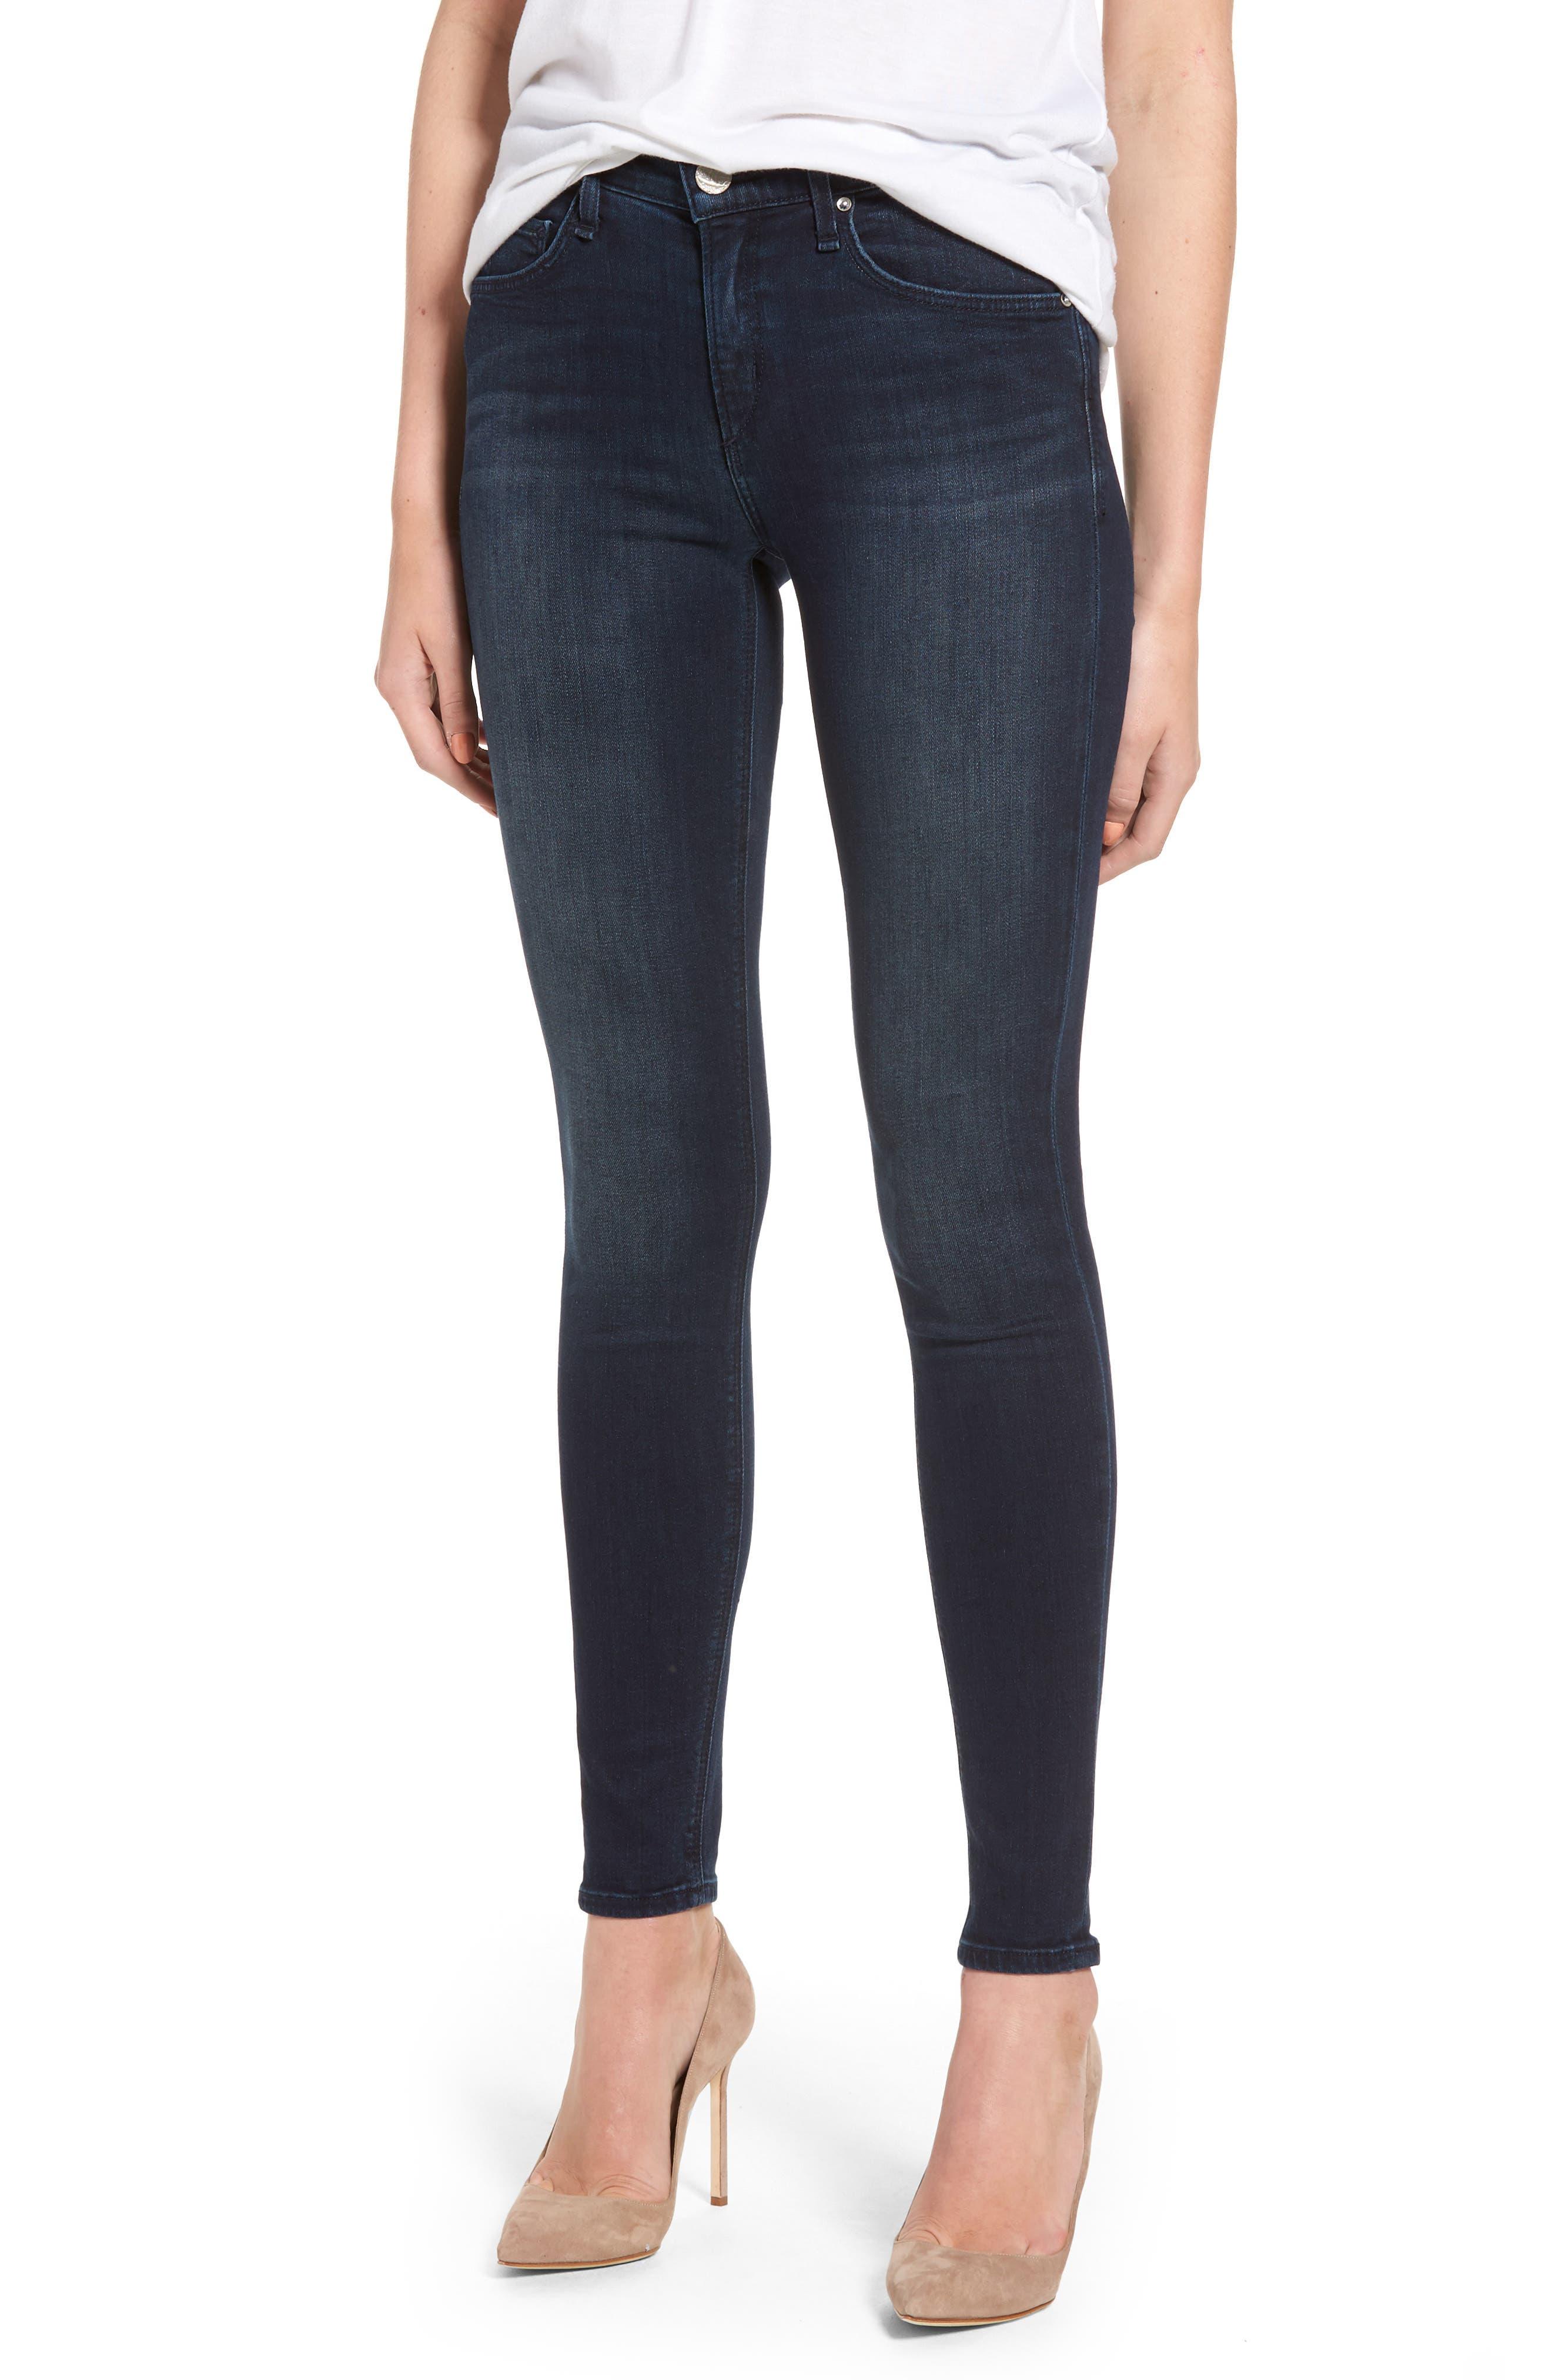 Newton Skinny Jeans,                             Main thumbnail 1, color,                             410